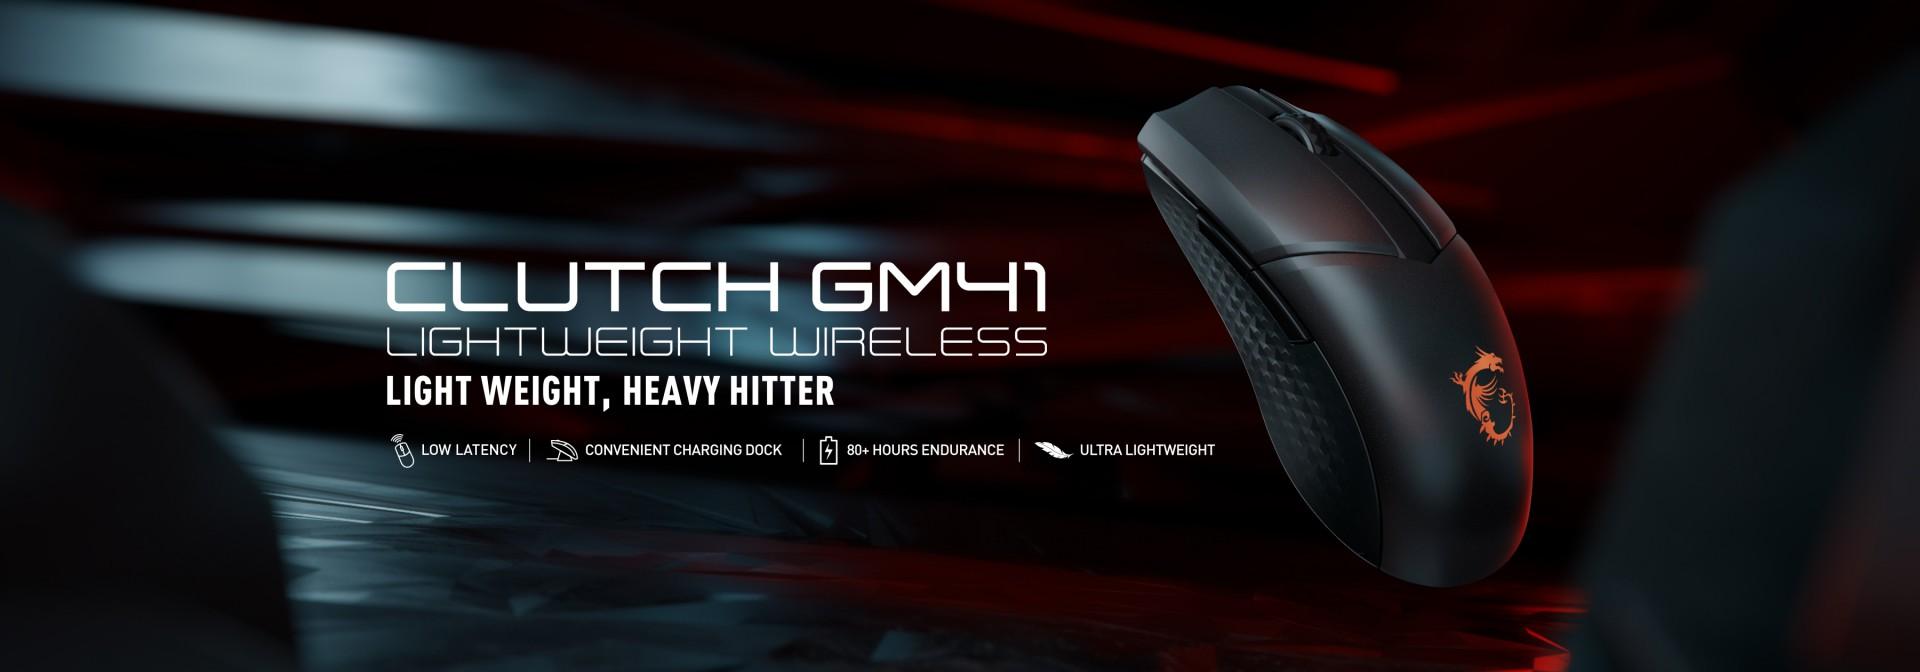 GM41 wireless